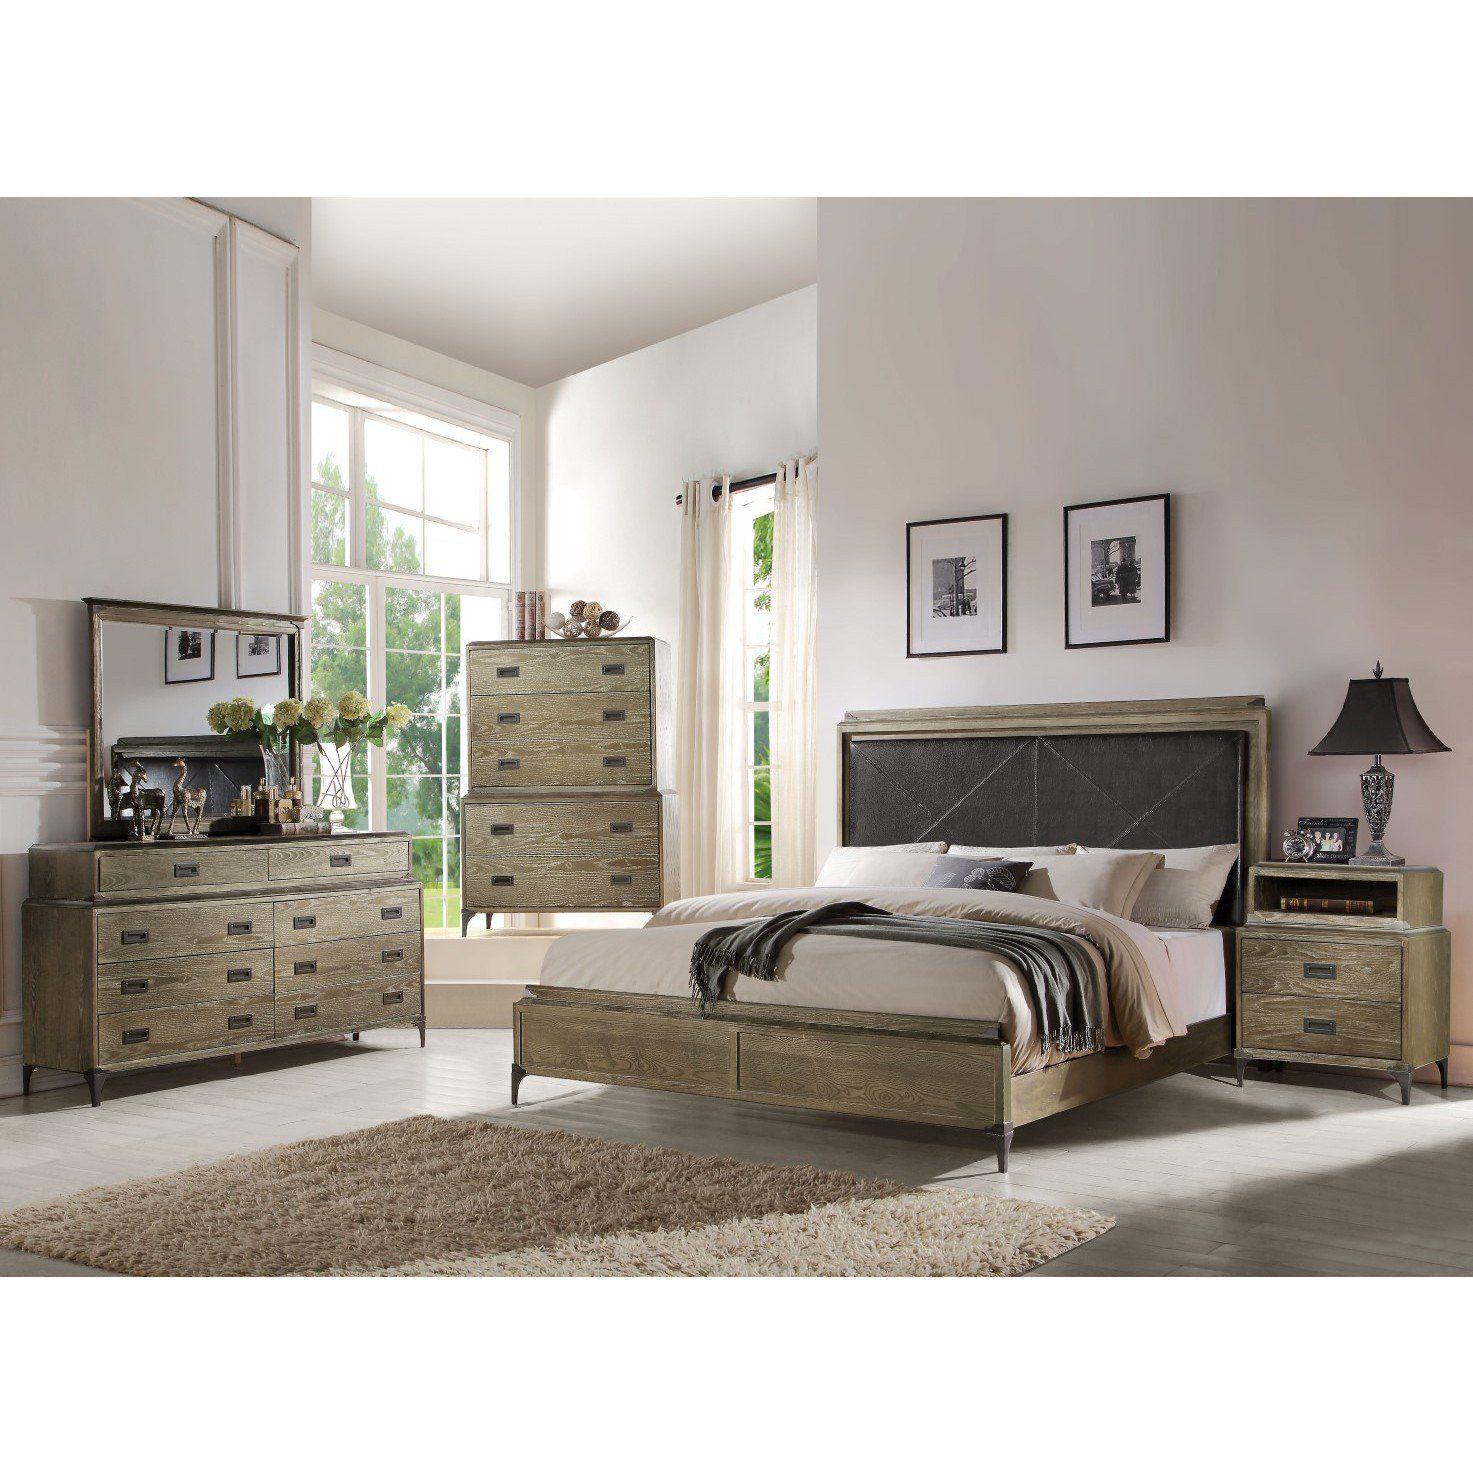 ACME Athouman Eastern King Bed (Panel) PU & Weathered Oak